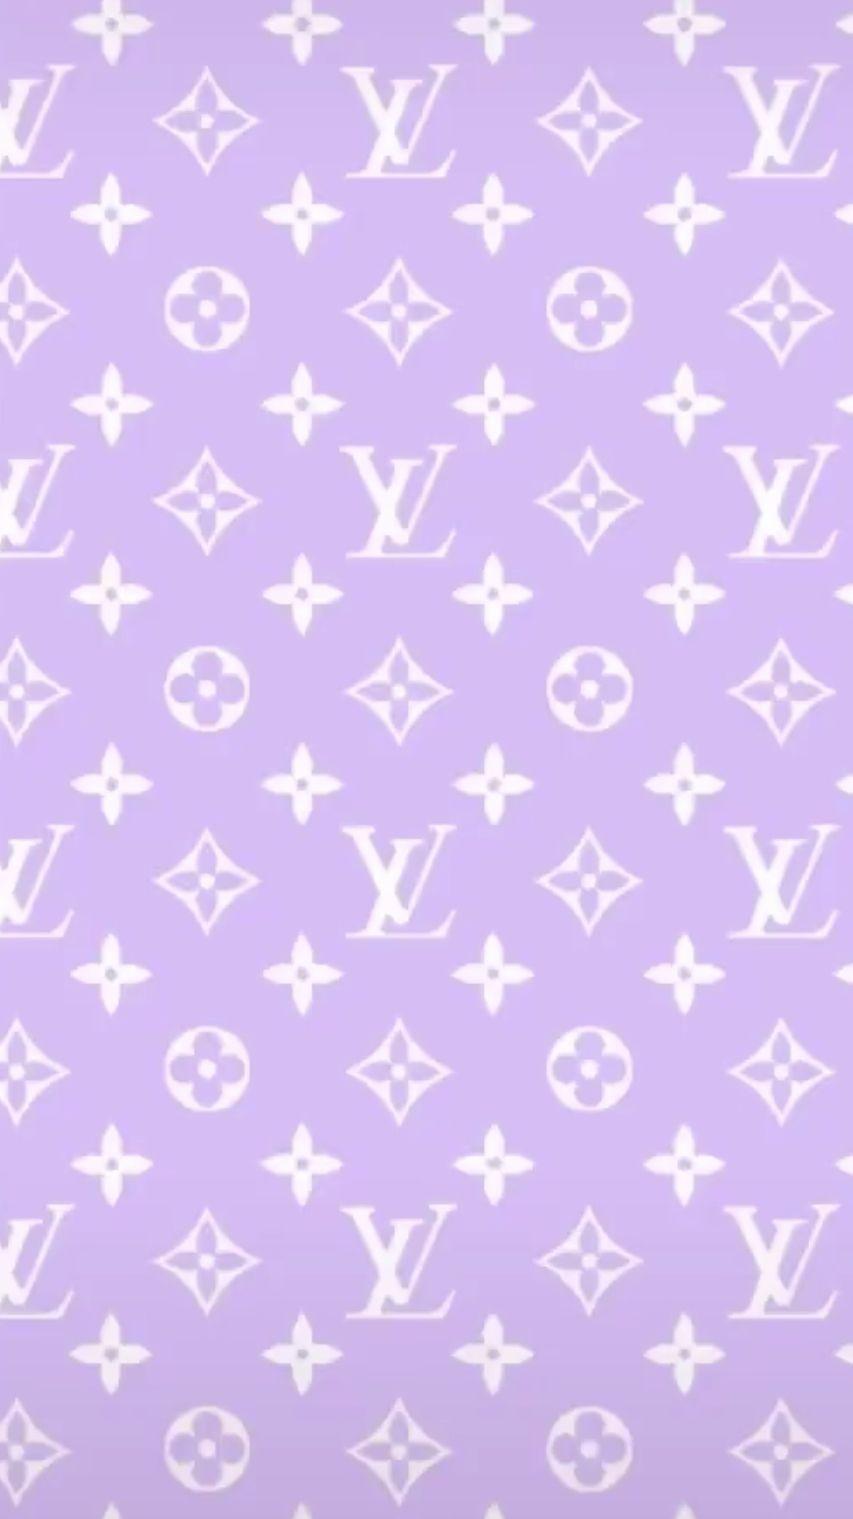 Lavender Louis Vuitton Wallpaper In 2020 Louis Vuitton Iphone Wallpaper Aesthetic Iphone Wallpaper Pretty Wallpaper Iphone